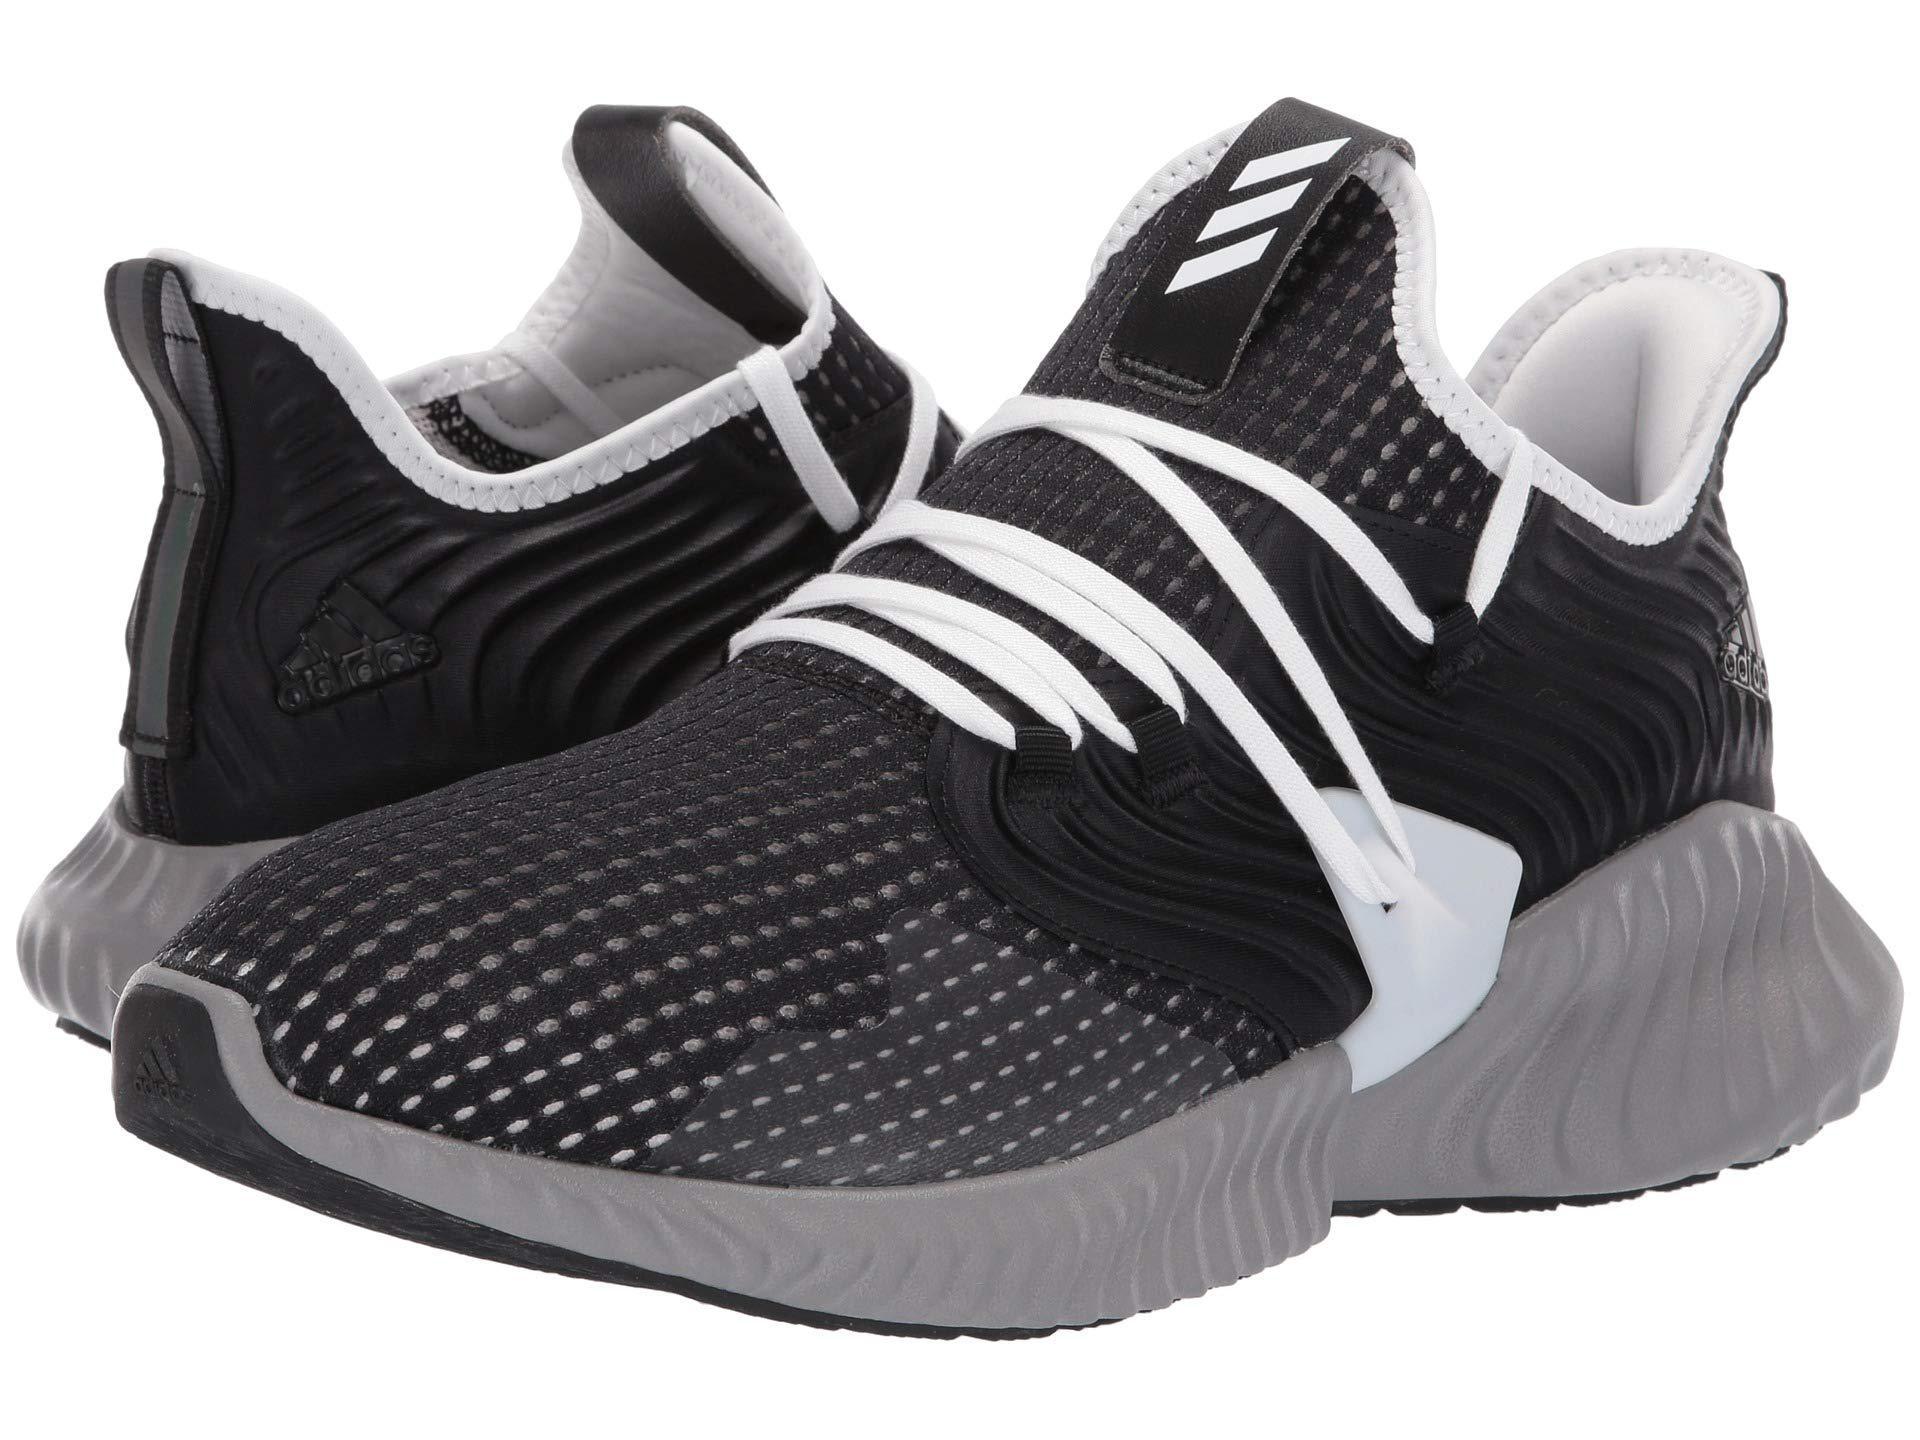 c000d532f Black AQ0562  skate shoes 5f196 a0f20 adidas Originals. Gray Alphabounce  Instinct .